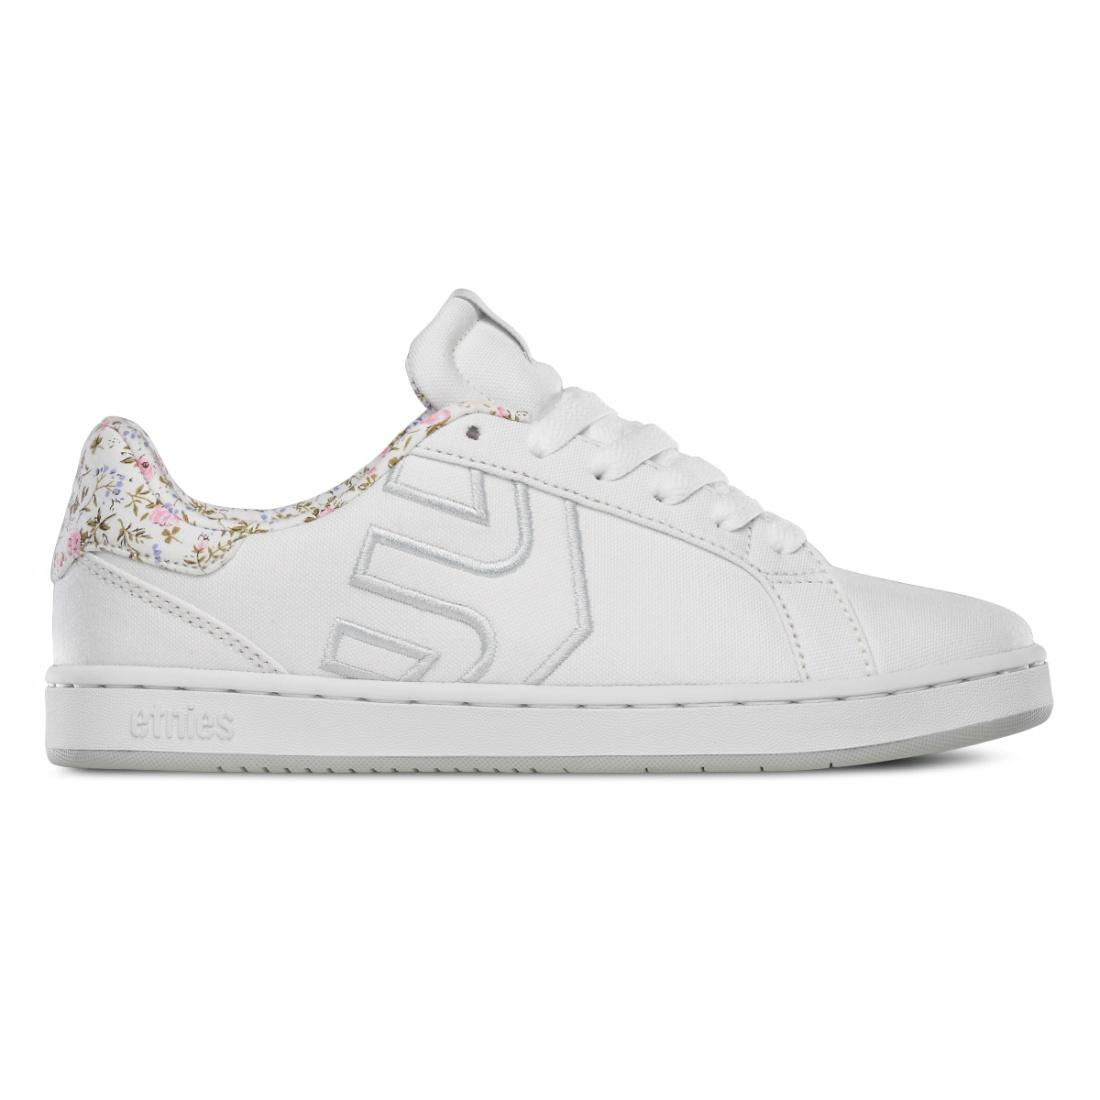 ETN-Fader LS White/White/Light Grey Girls Shoes